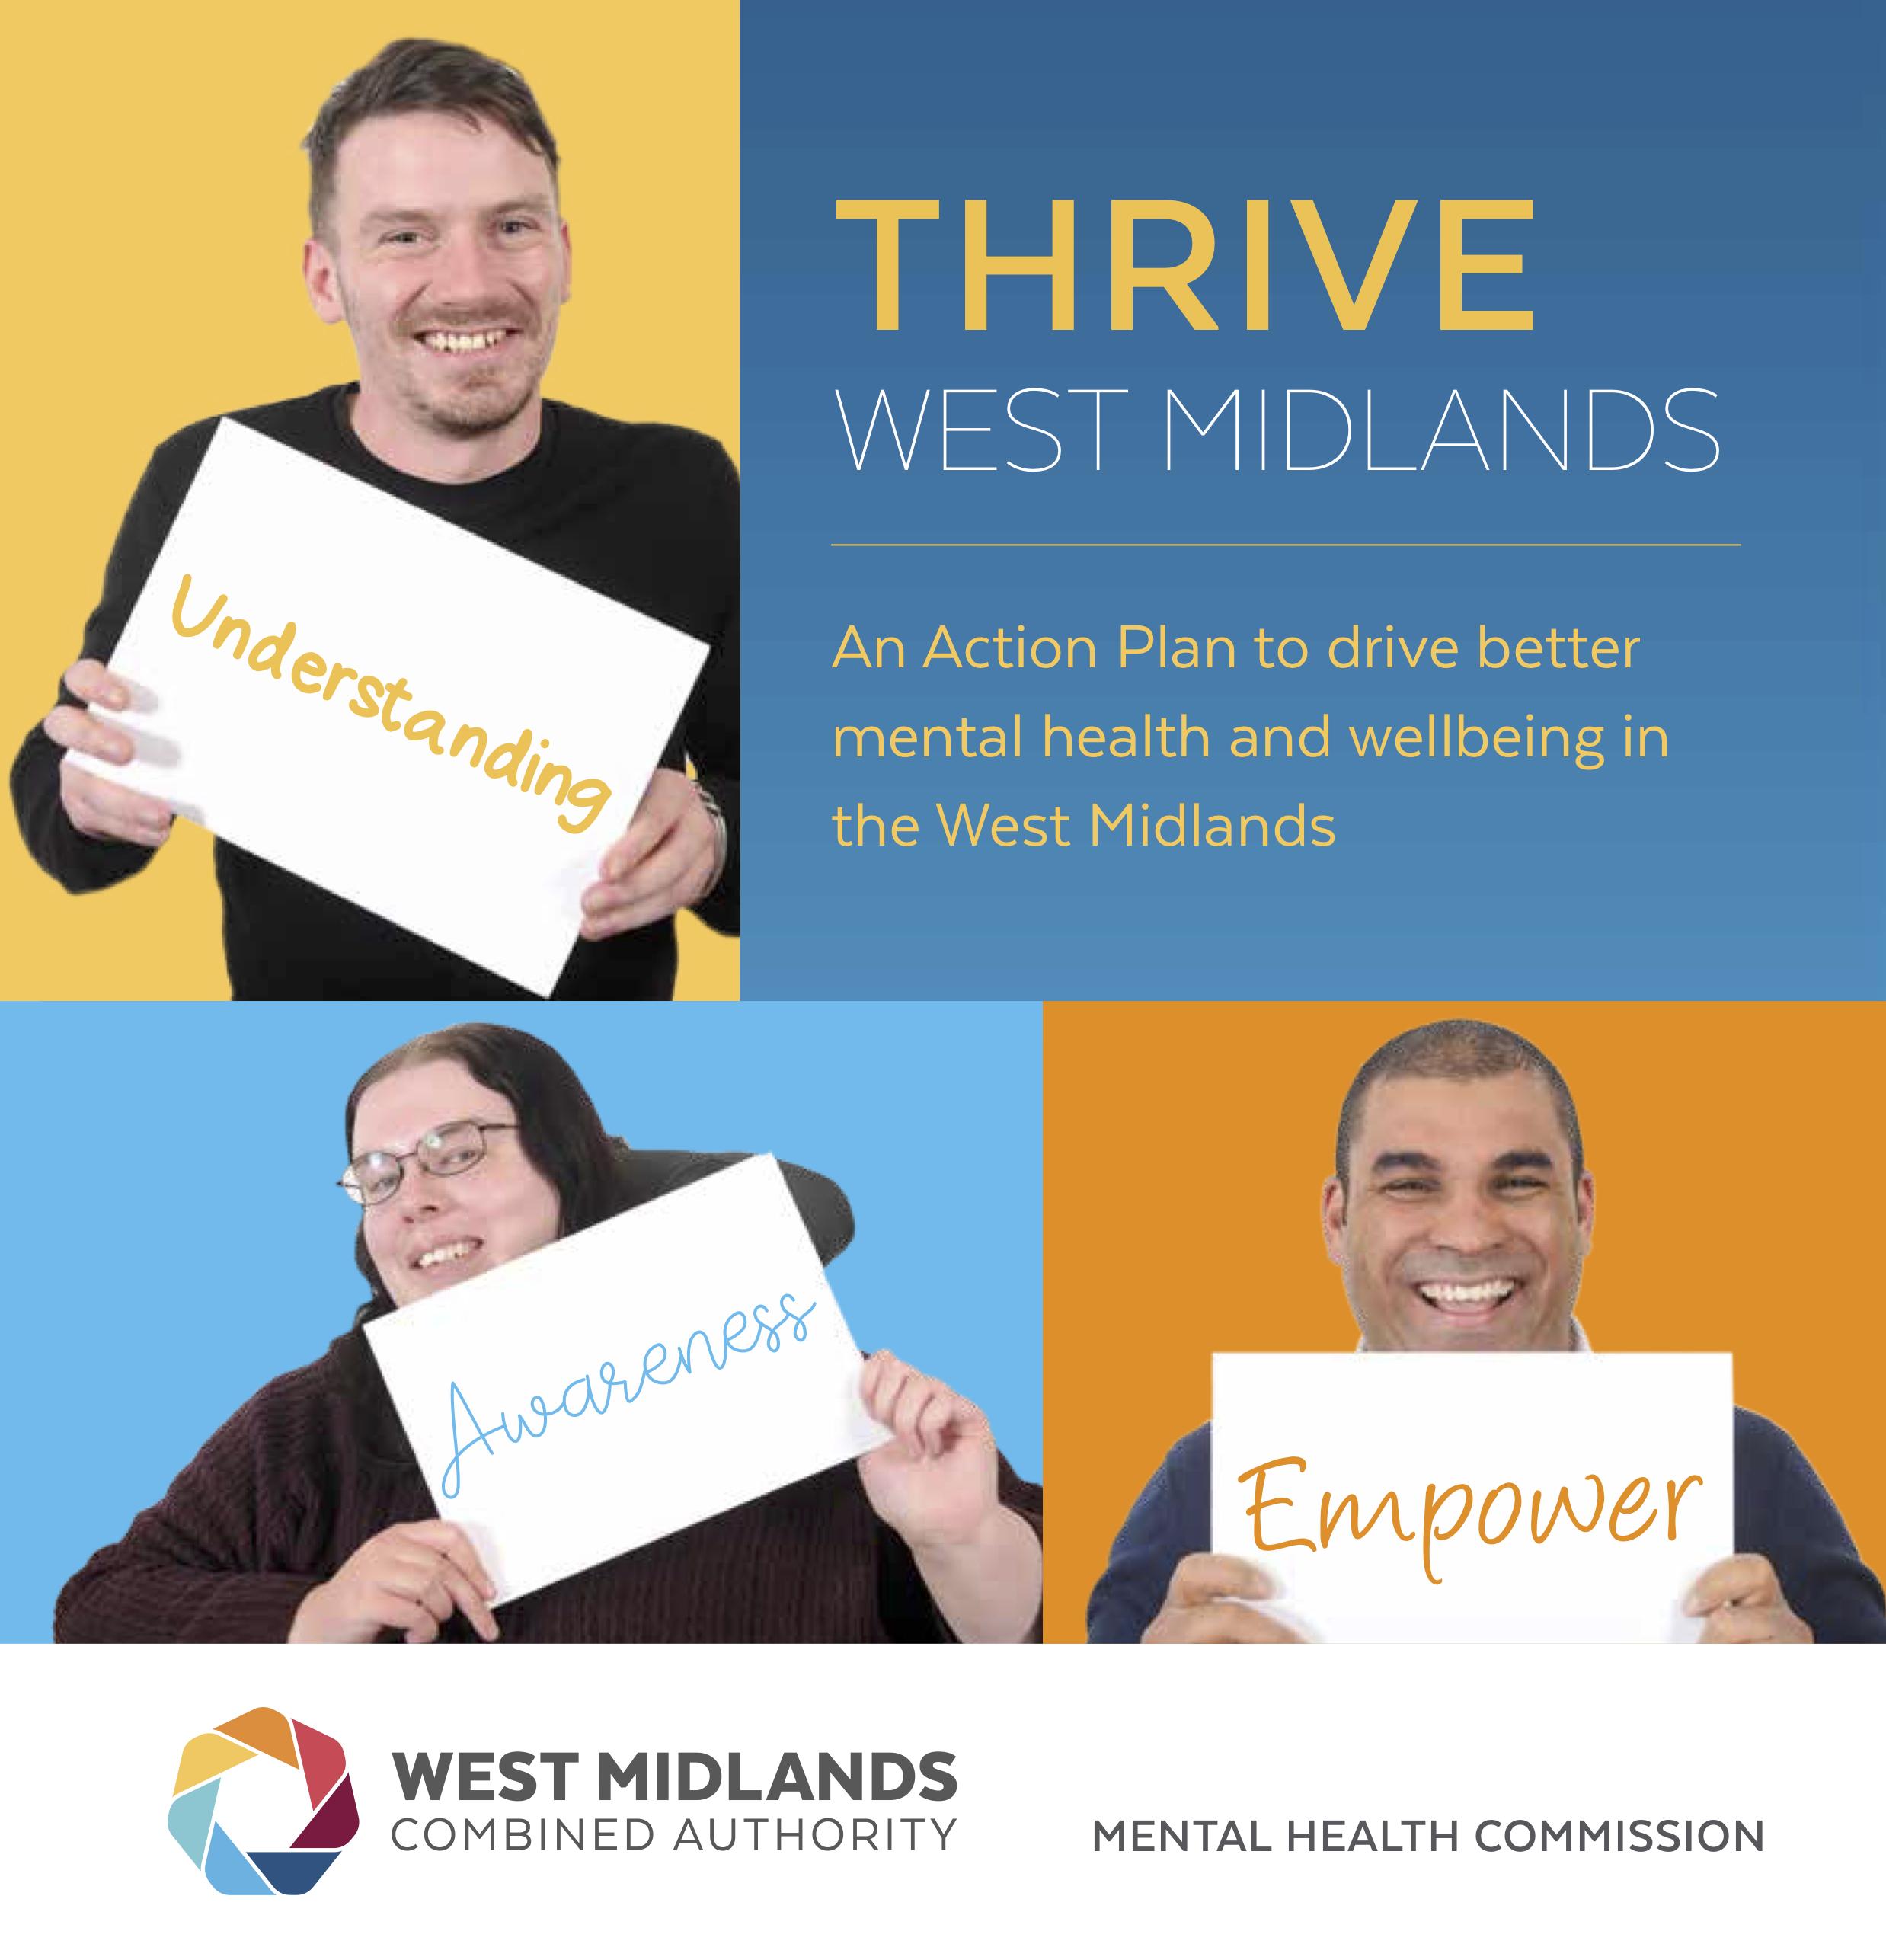 steve-gilbert-thrive-west-midlands-mental-health.jpg